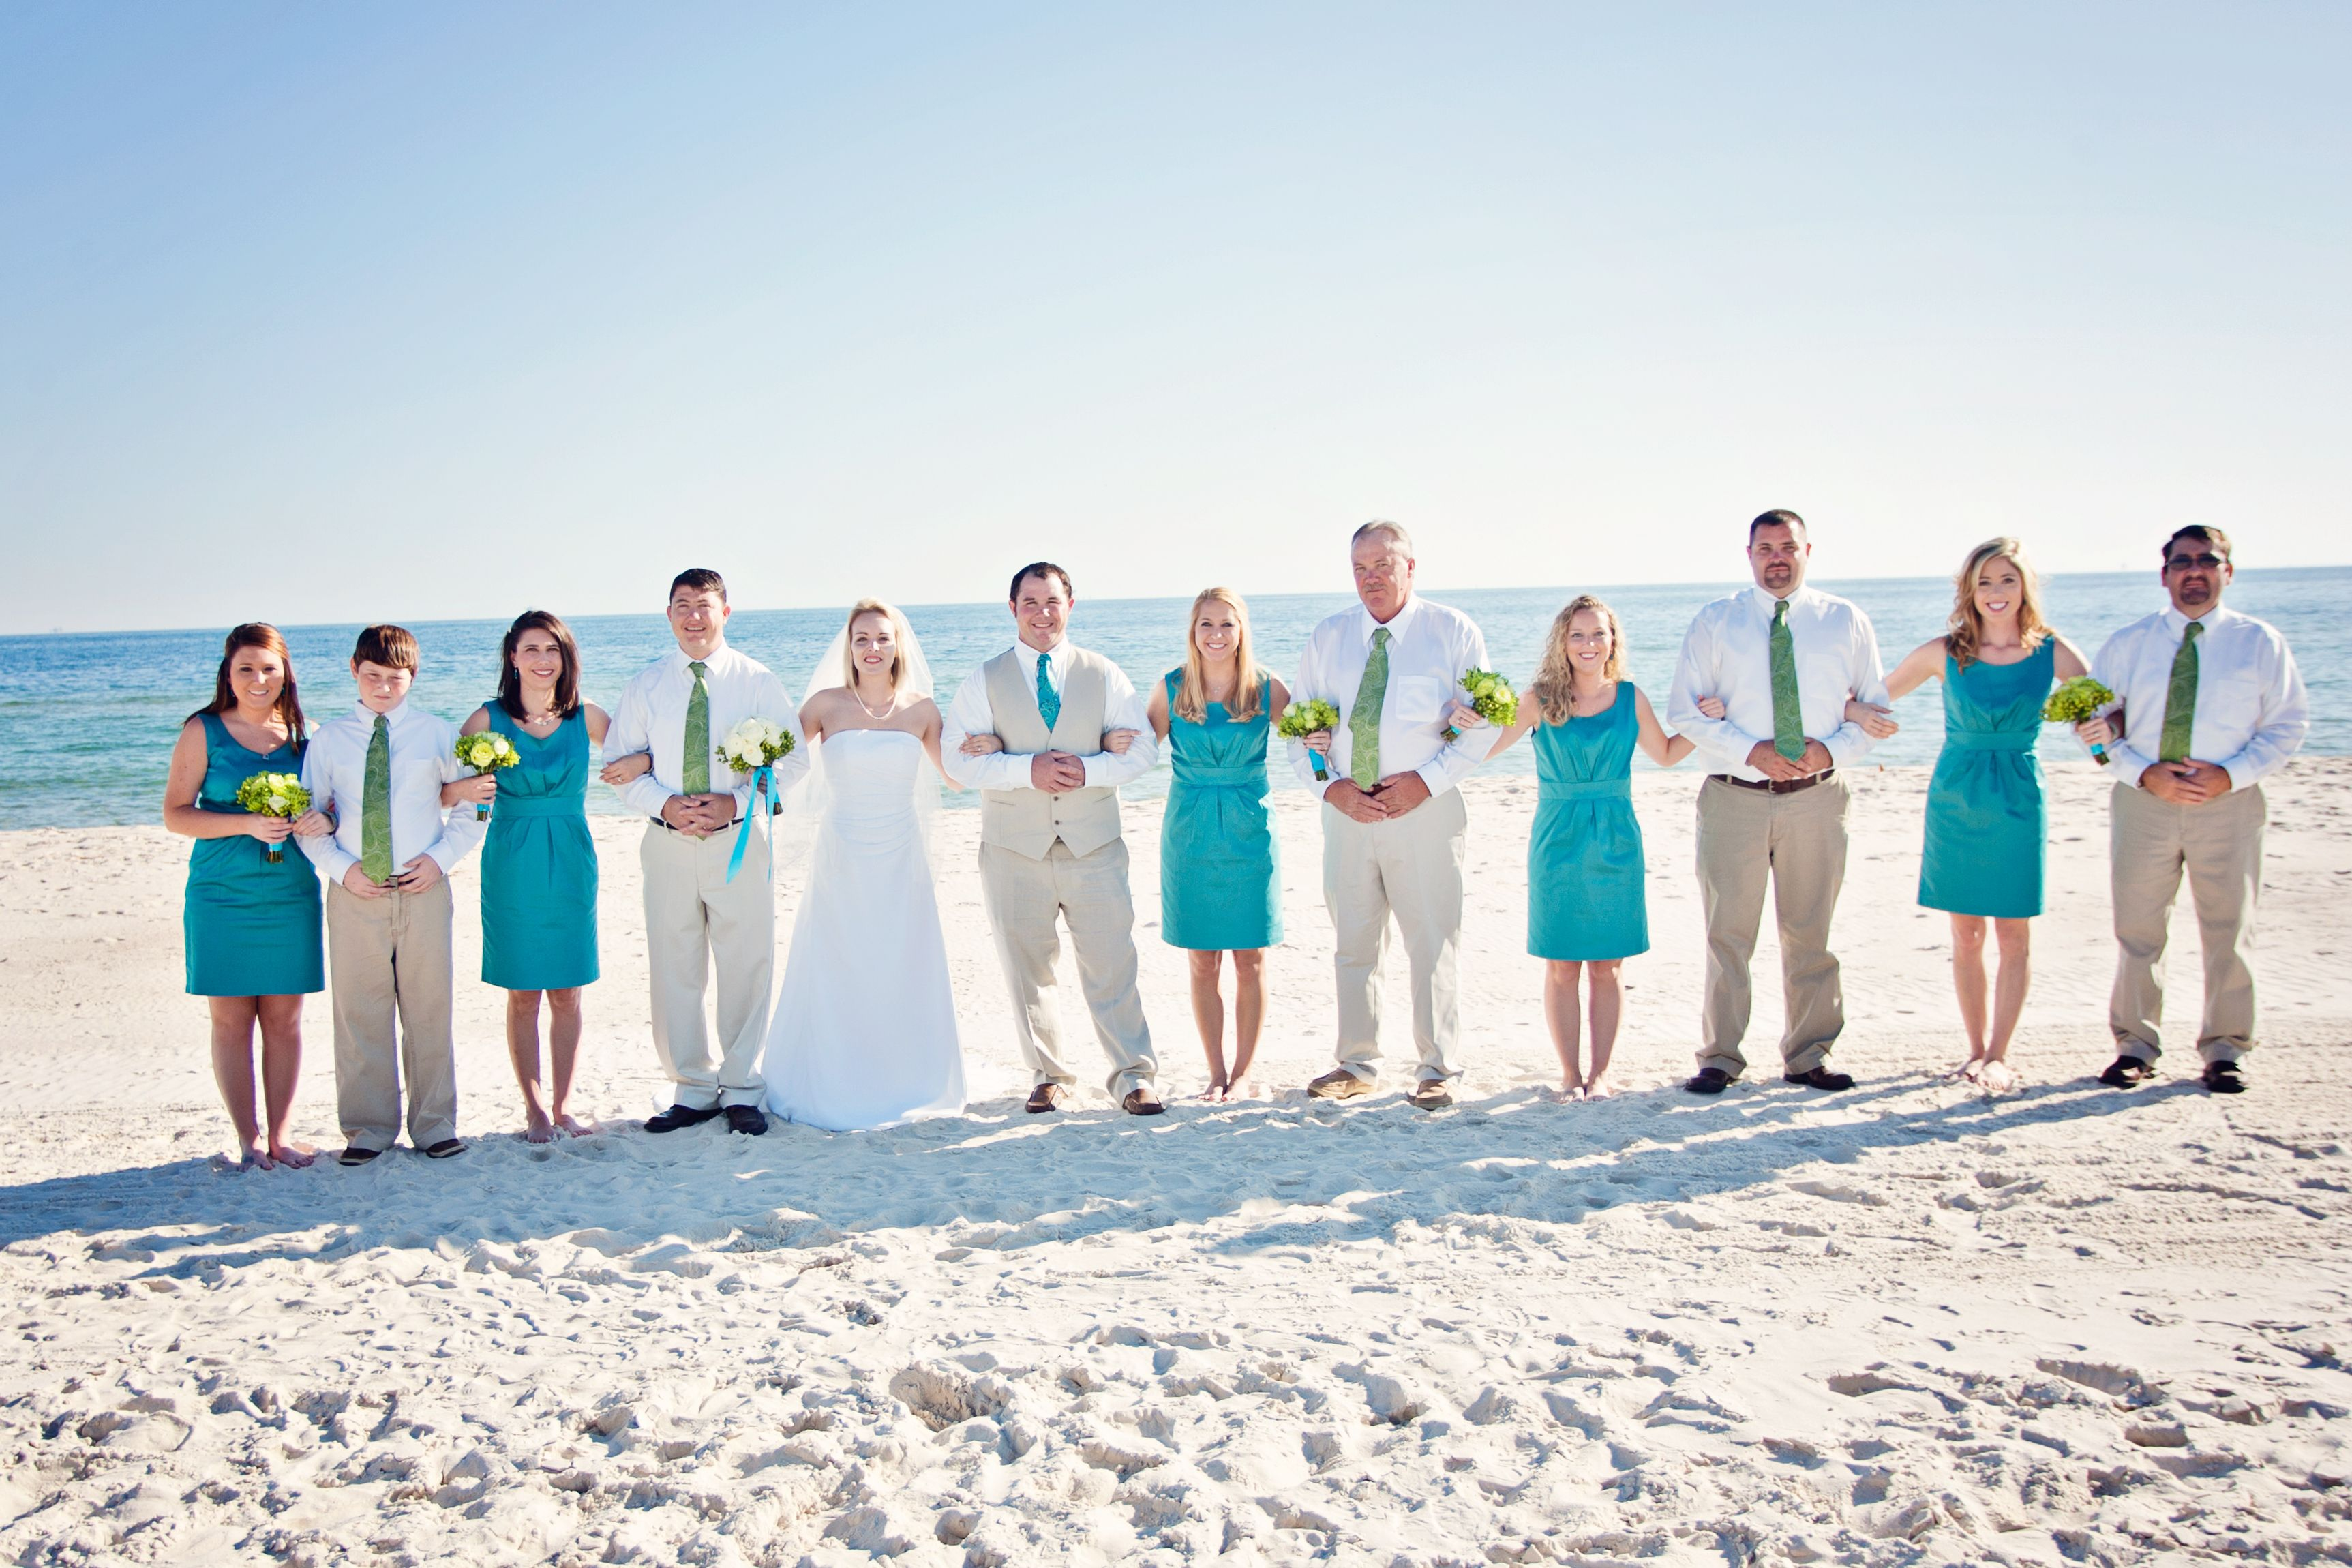 beach wedding bridal party Bridal party photos, Wedding